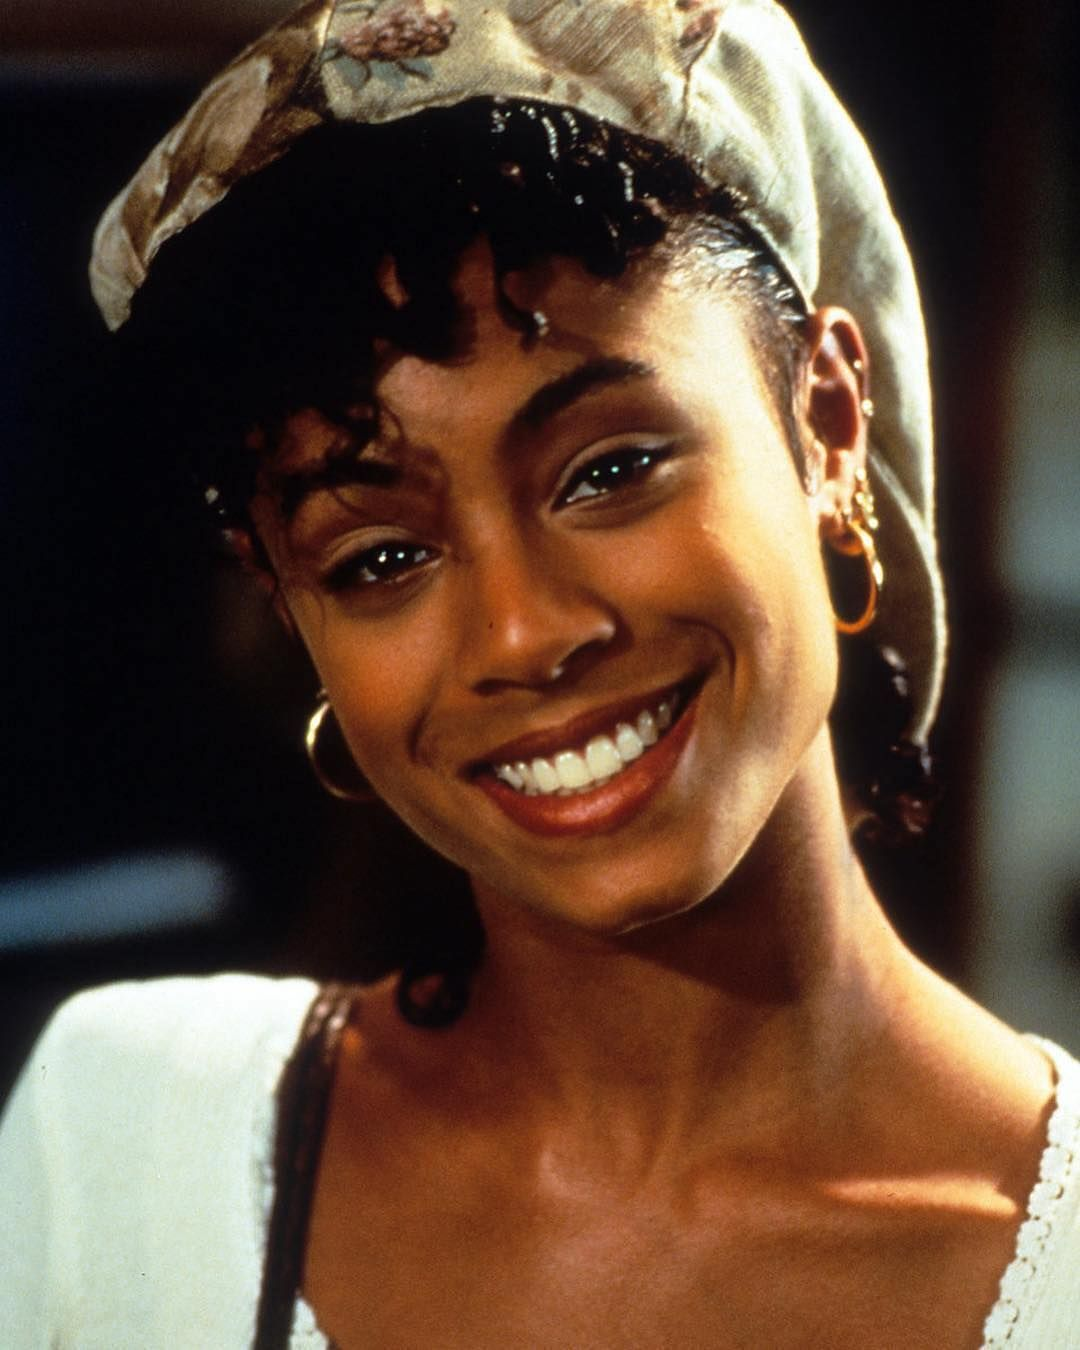 Jadapinkettsmith On Set Of Jasonslyric 94 Beautiful Black Women Black Beauties Black Girl Aesthetic